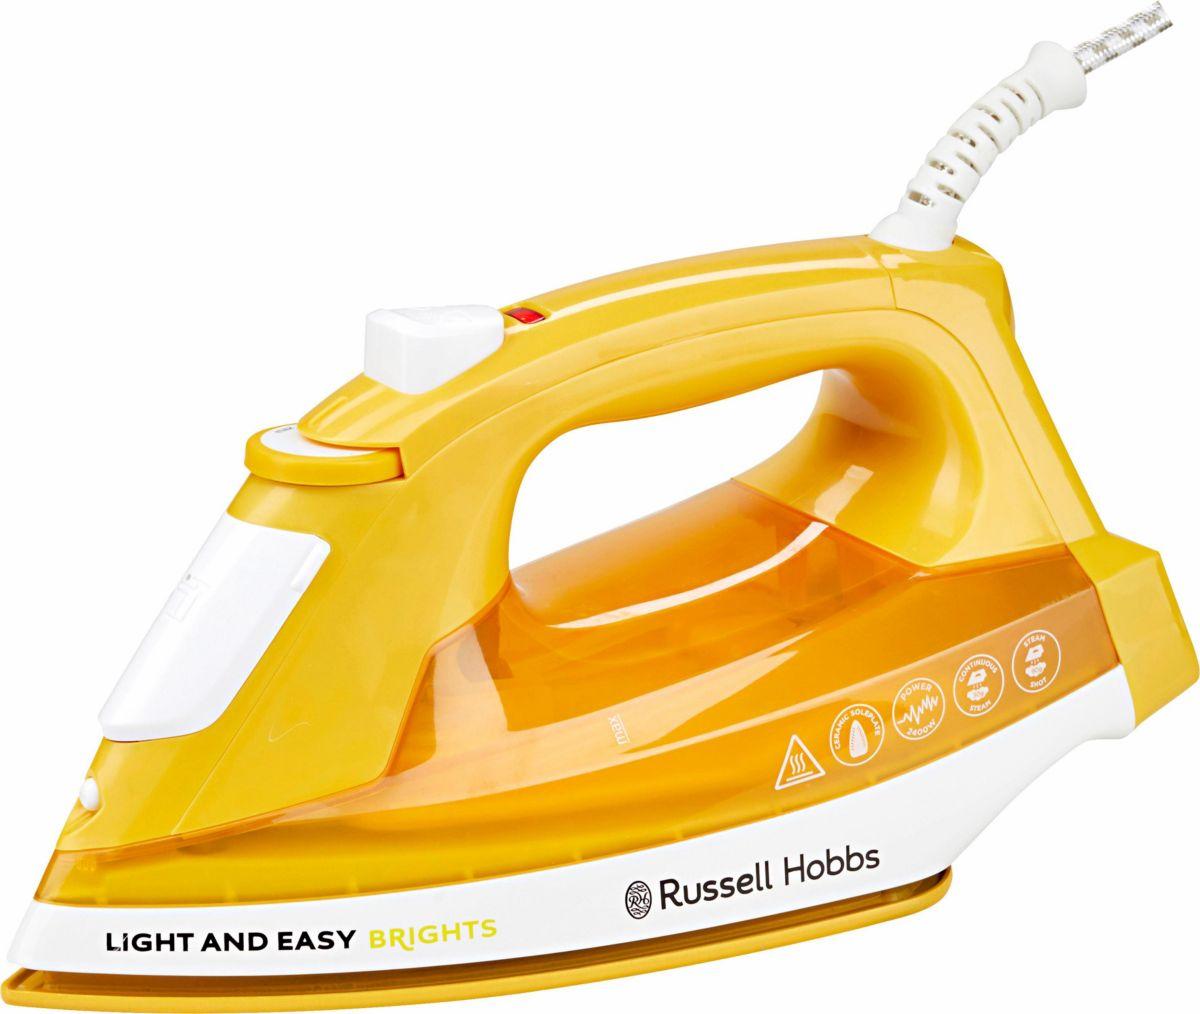 Russell Hobbs Dampfbügeleisen Light&Easy Brights 24800-56, Keramik-Bügelsohle, 2400 Watt, Mango